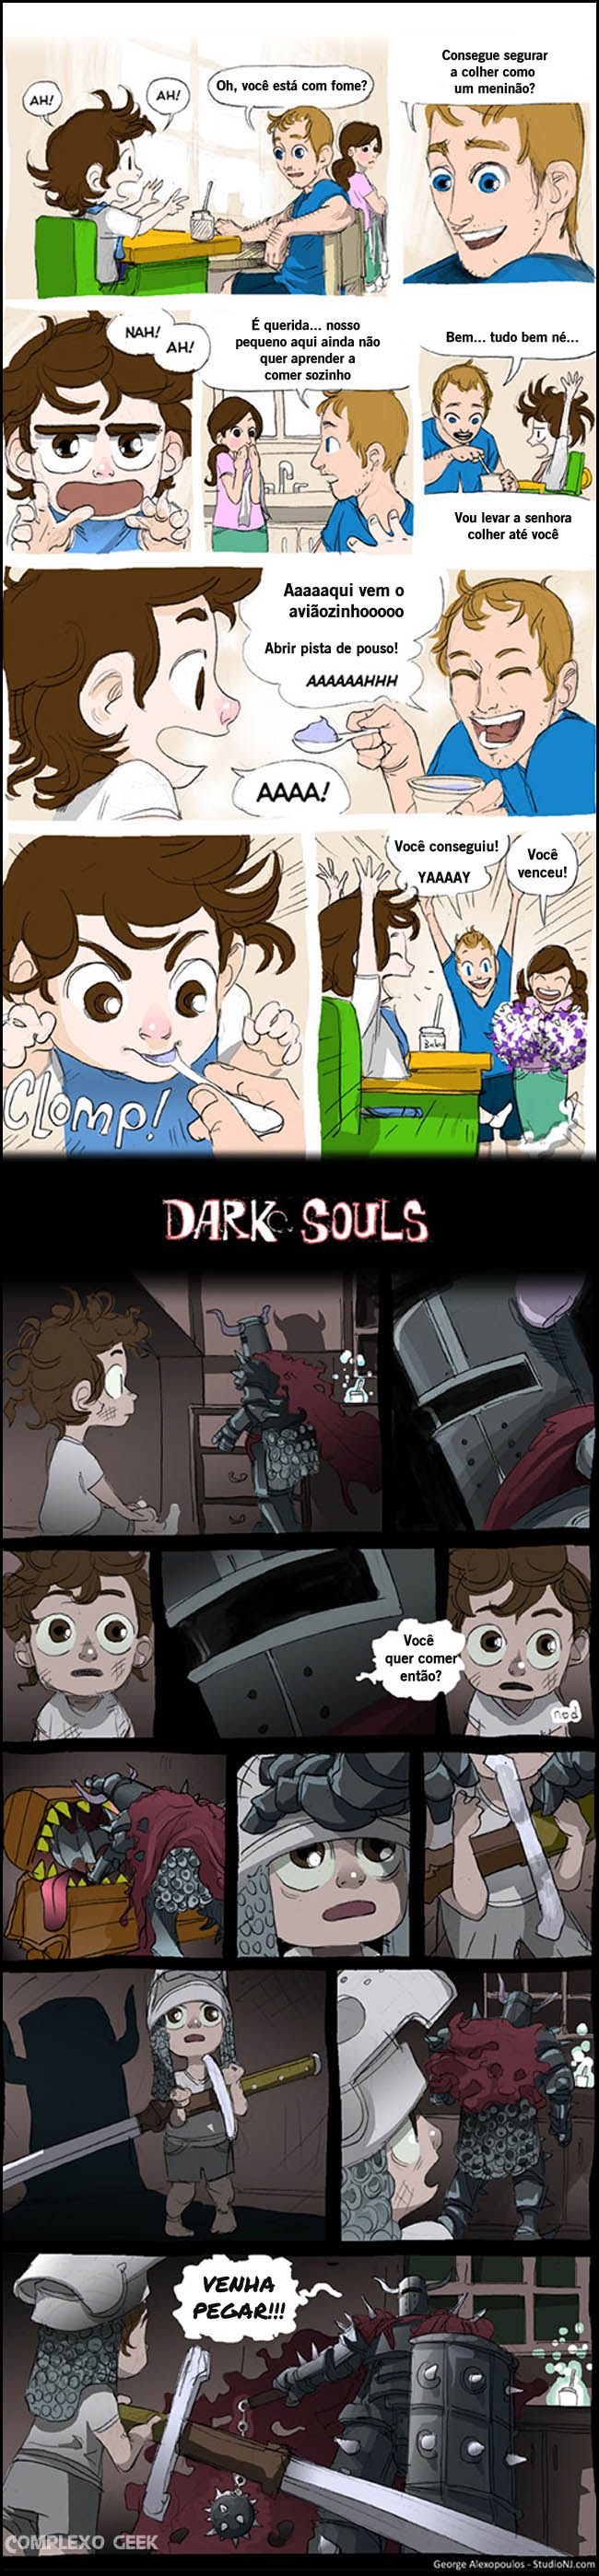 0 a dark souls